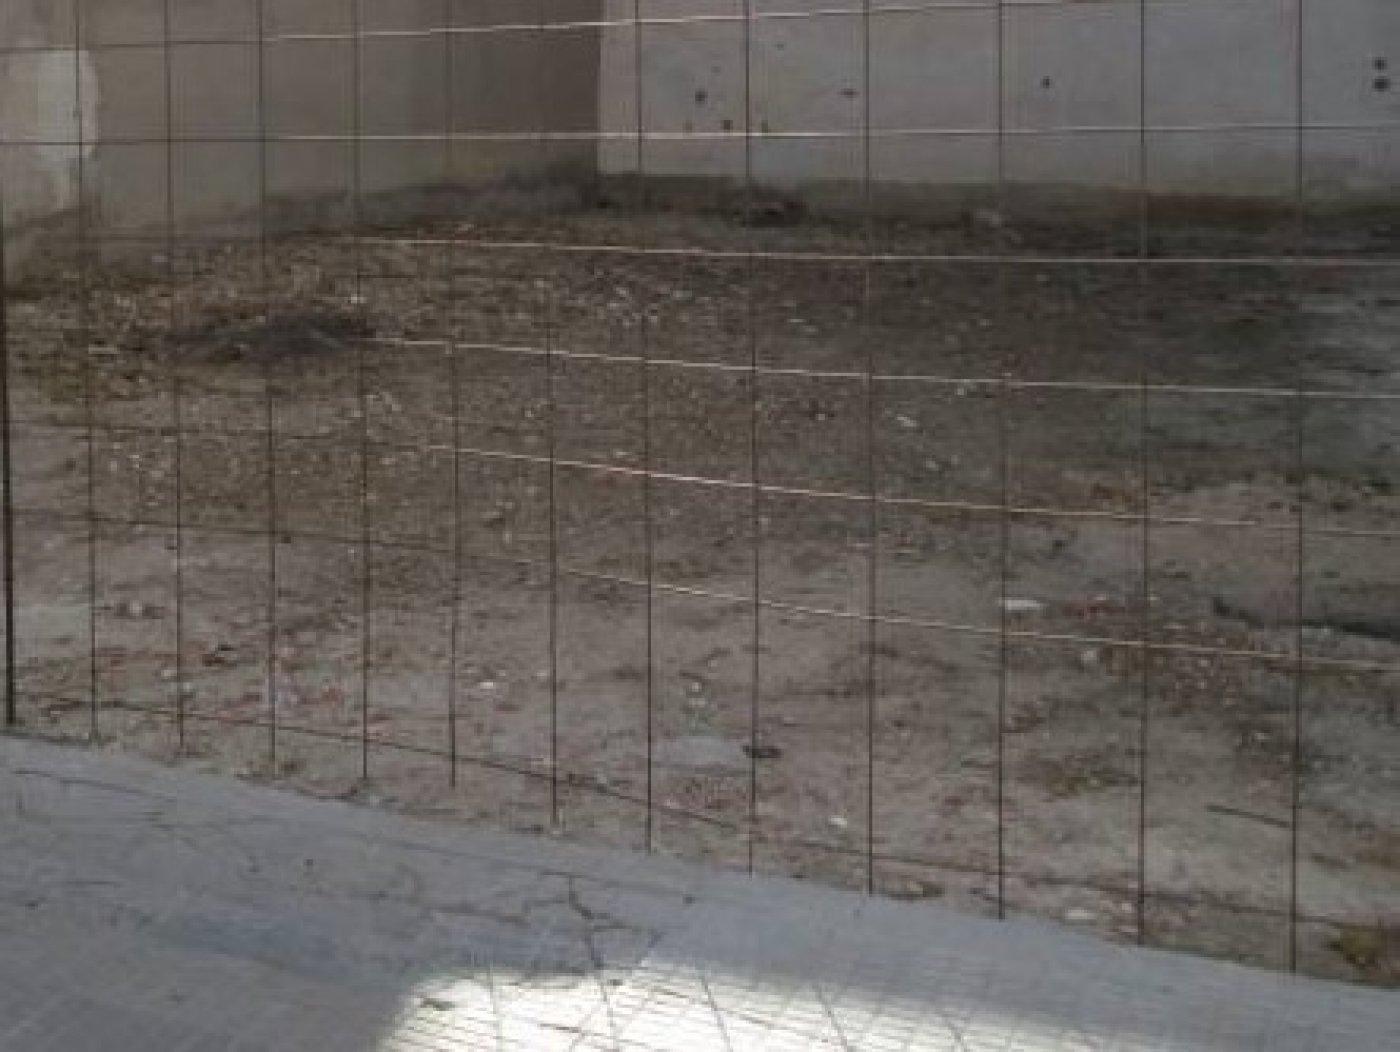 Terreno Urbano · Petrer · Casco Antiguo - Salinetas 65.000€€